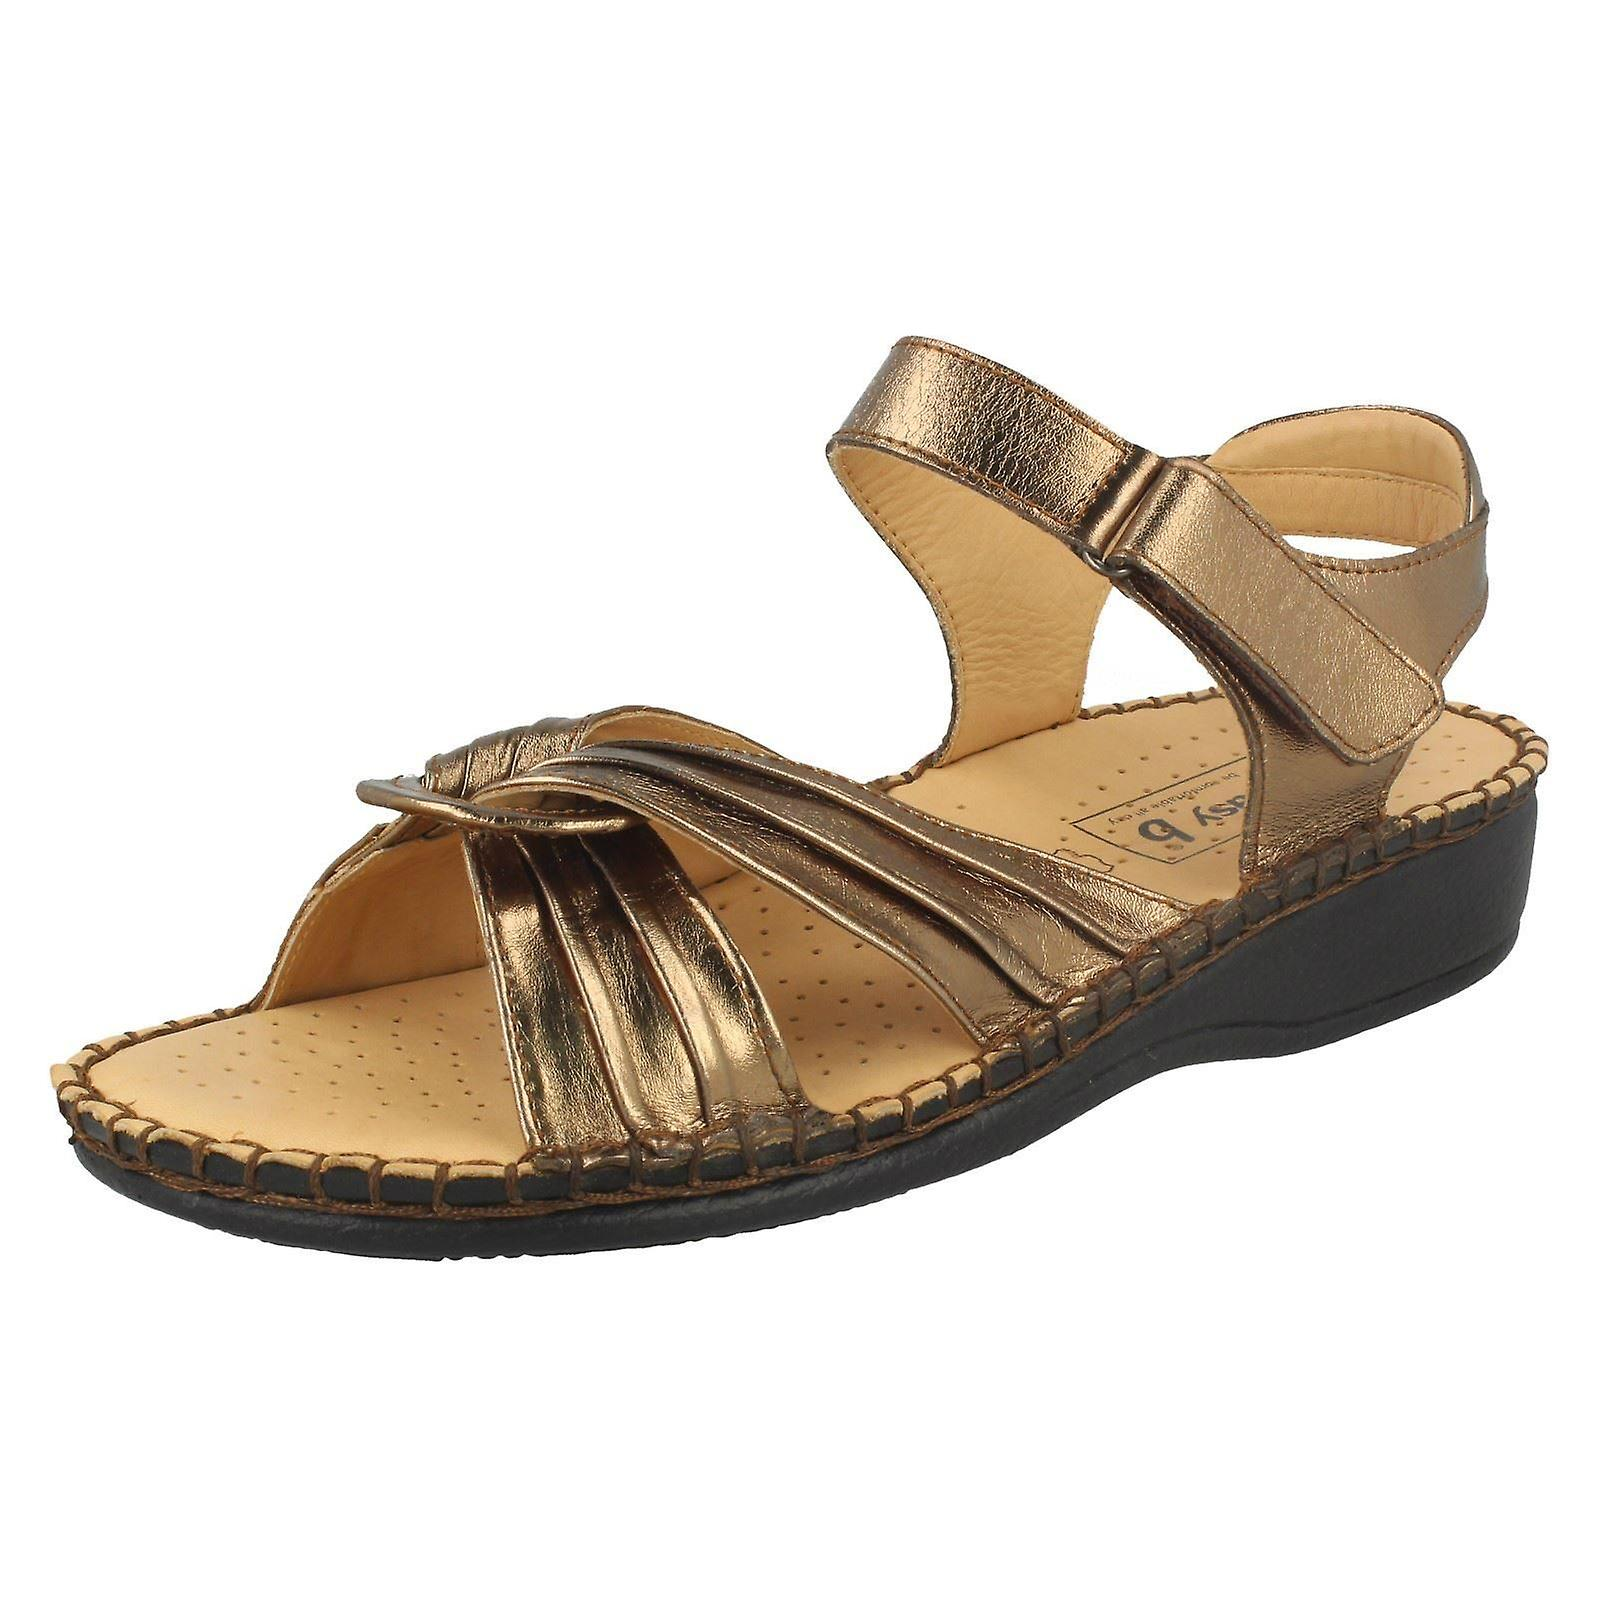 Aktiv Boys Jcdees Slingback Sandals Clothes, Shoes & Accessories